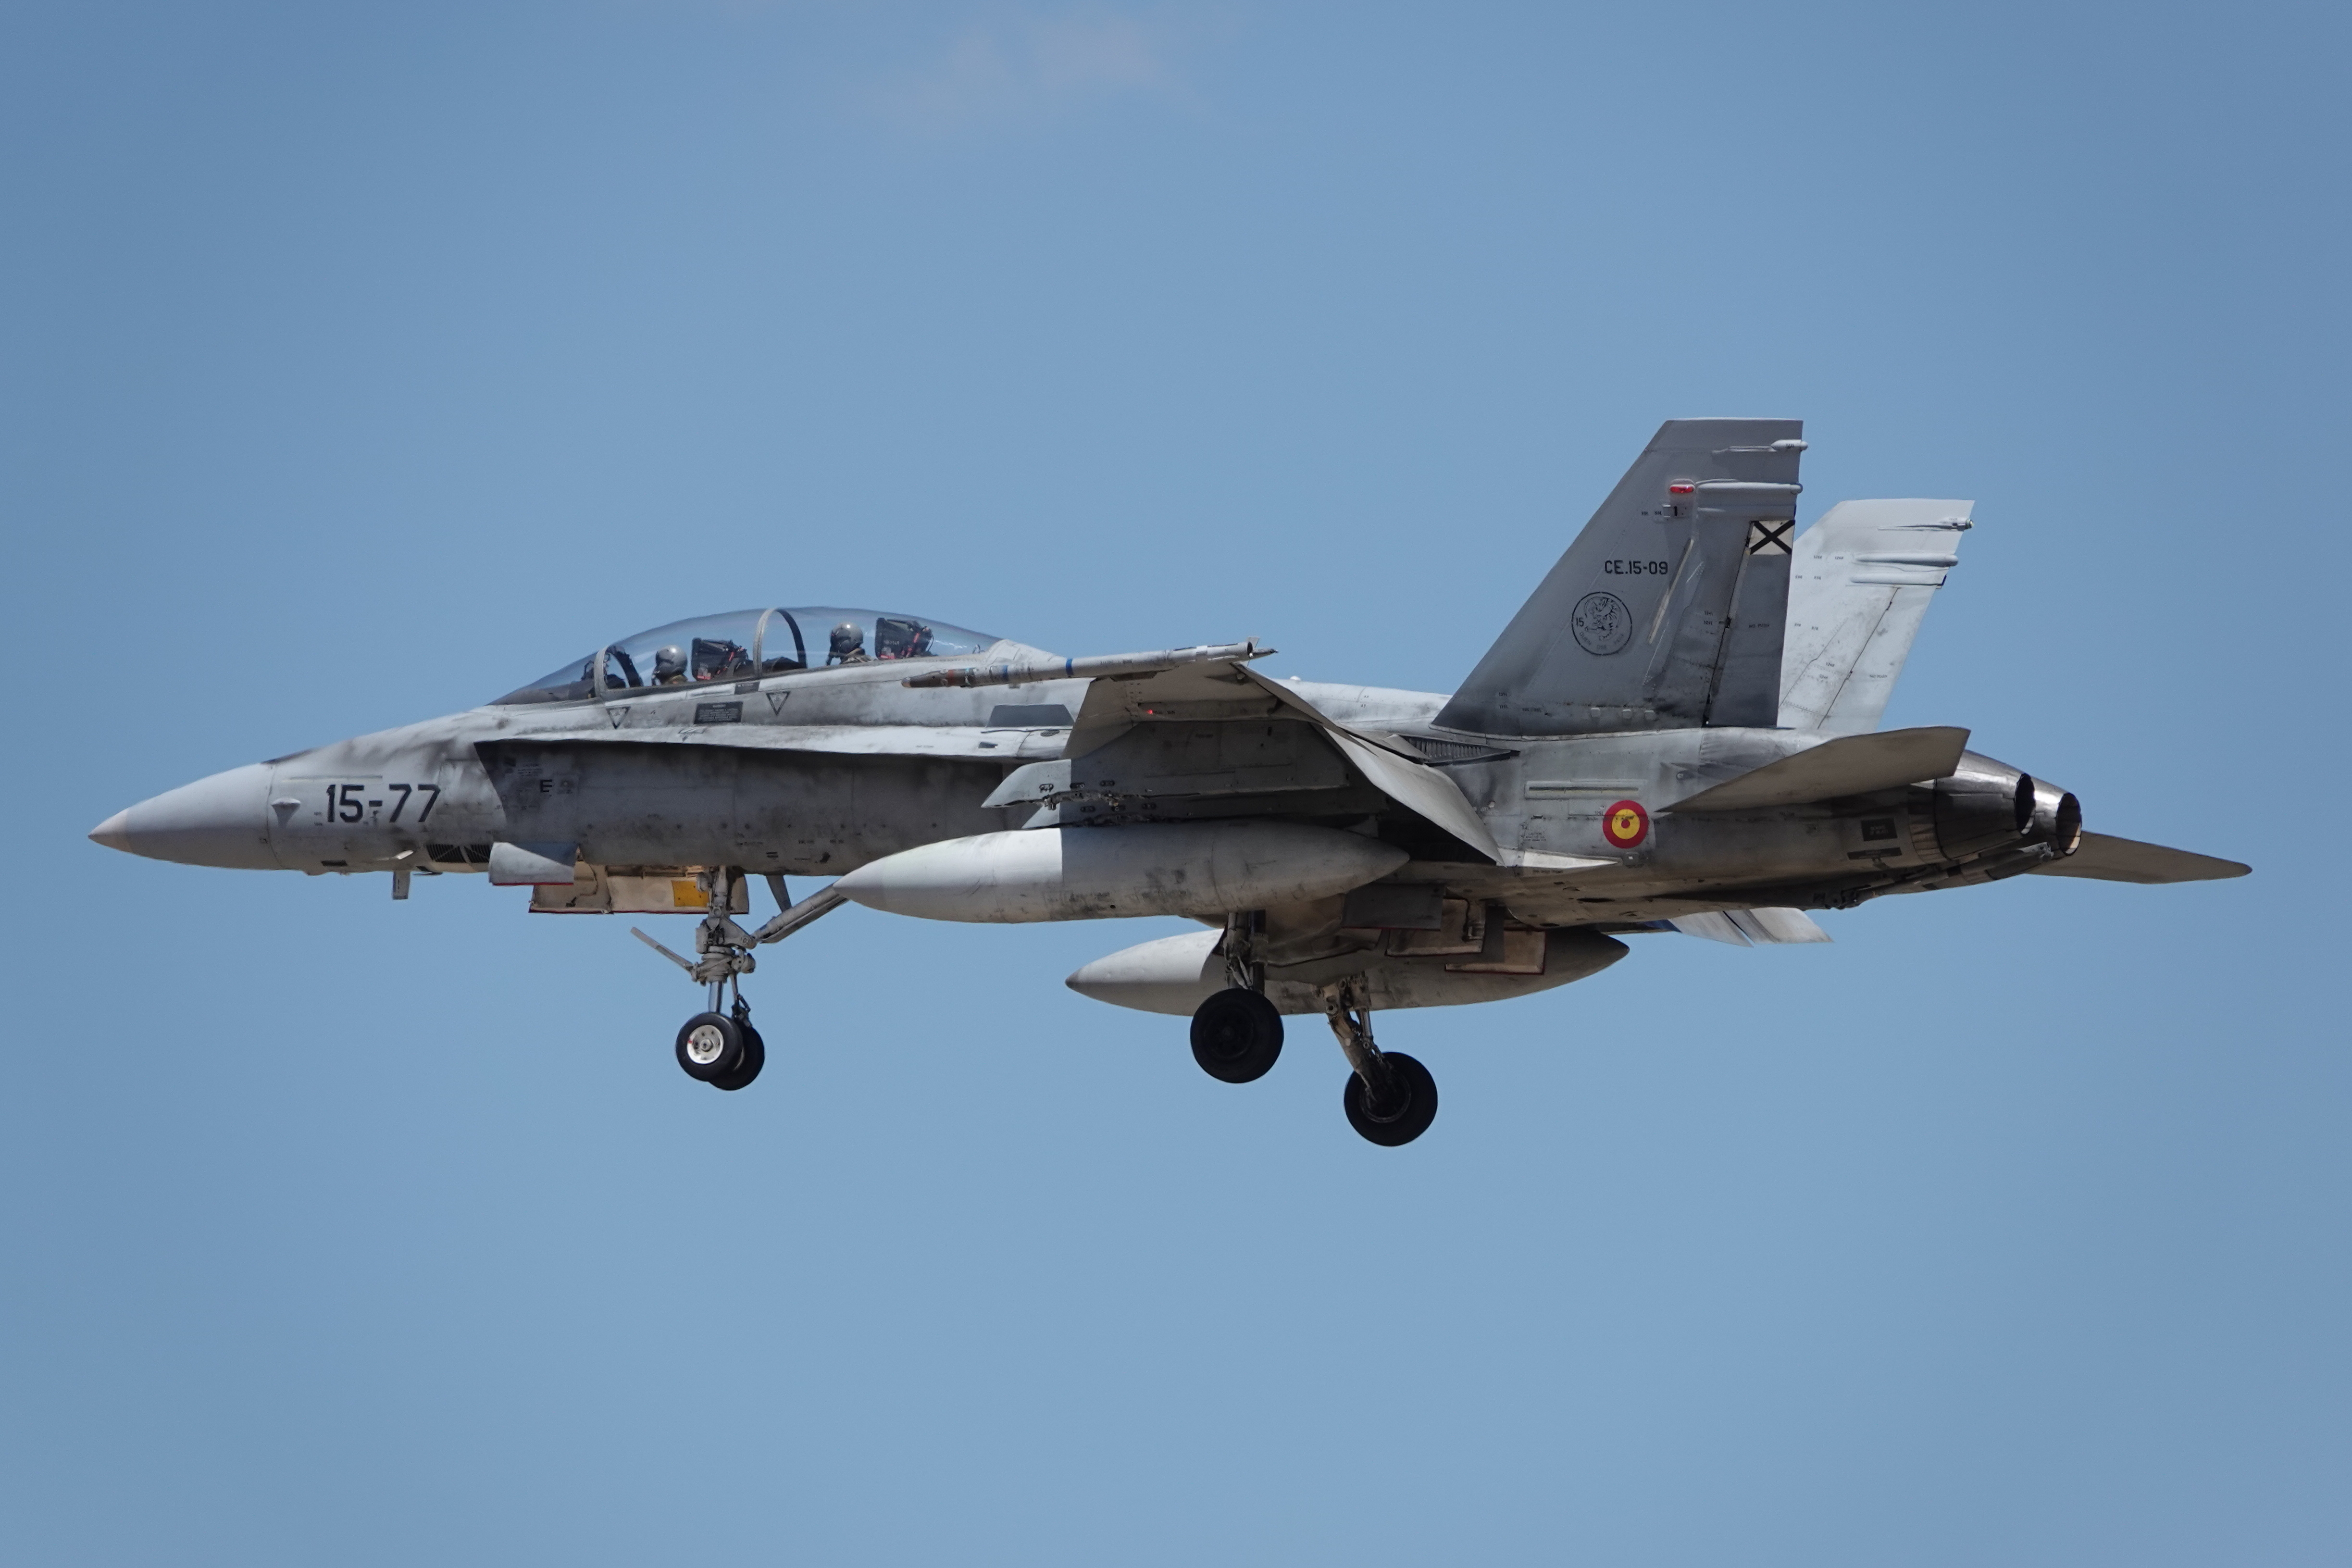 F-18 15-77